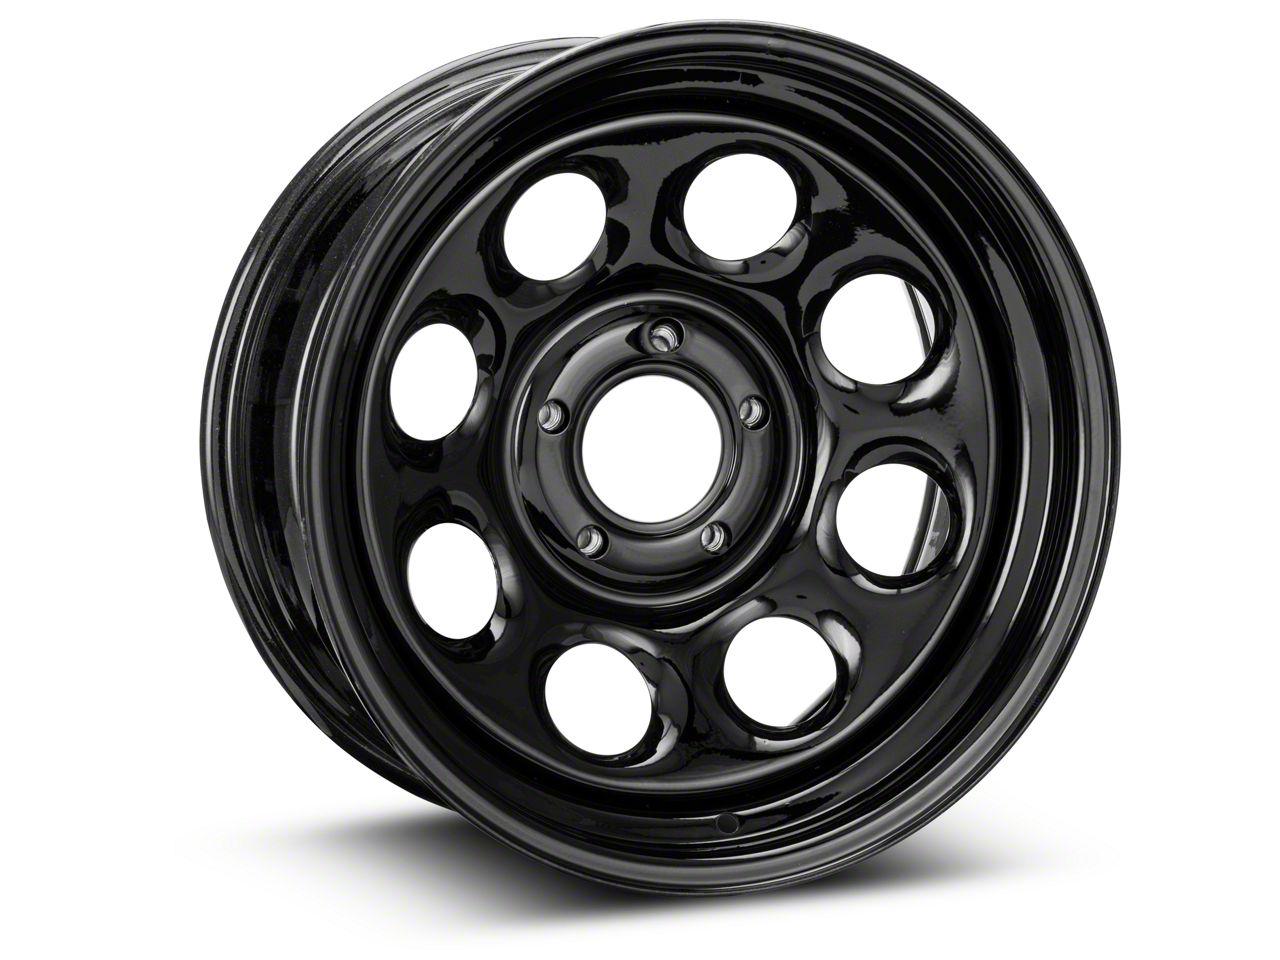 Pro Comp Steel Series 98 Rock Crawler Gloss Black Wheel - 17x8 (07-18 Jeep Wrangler JK)